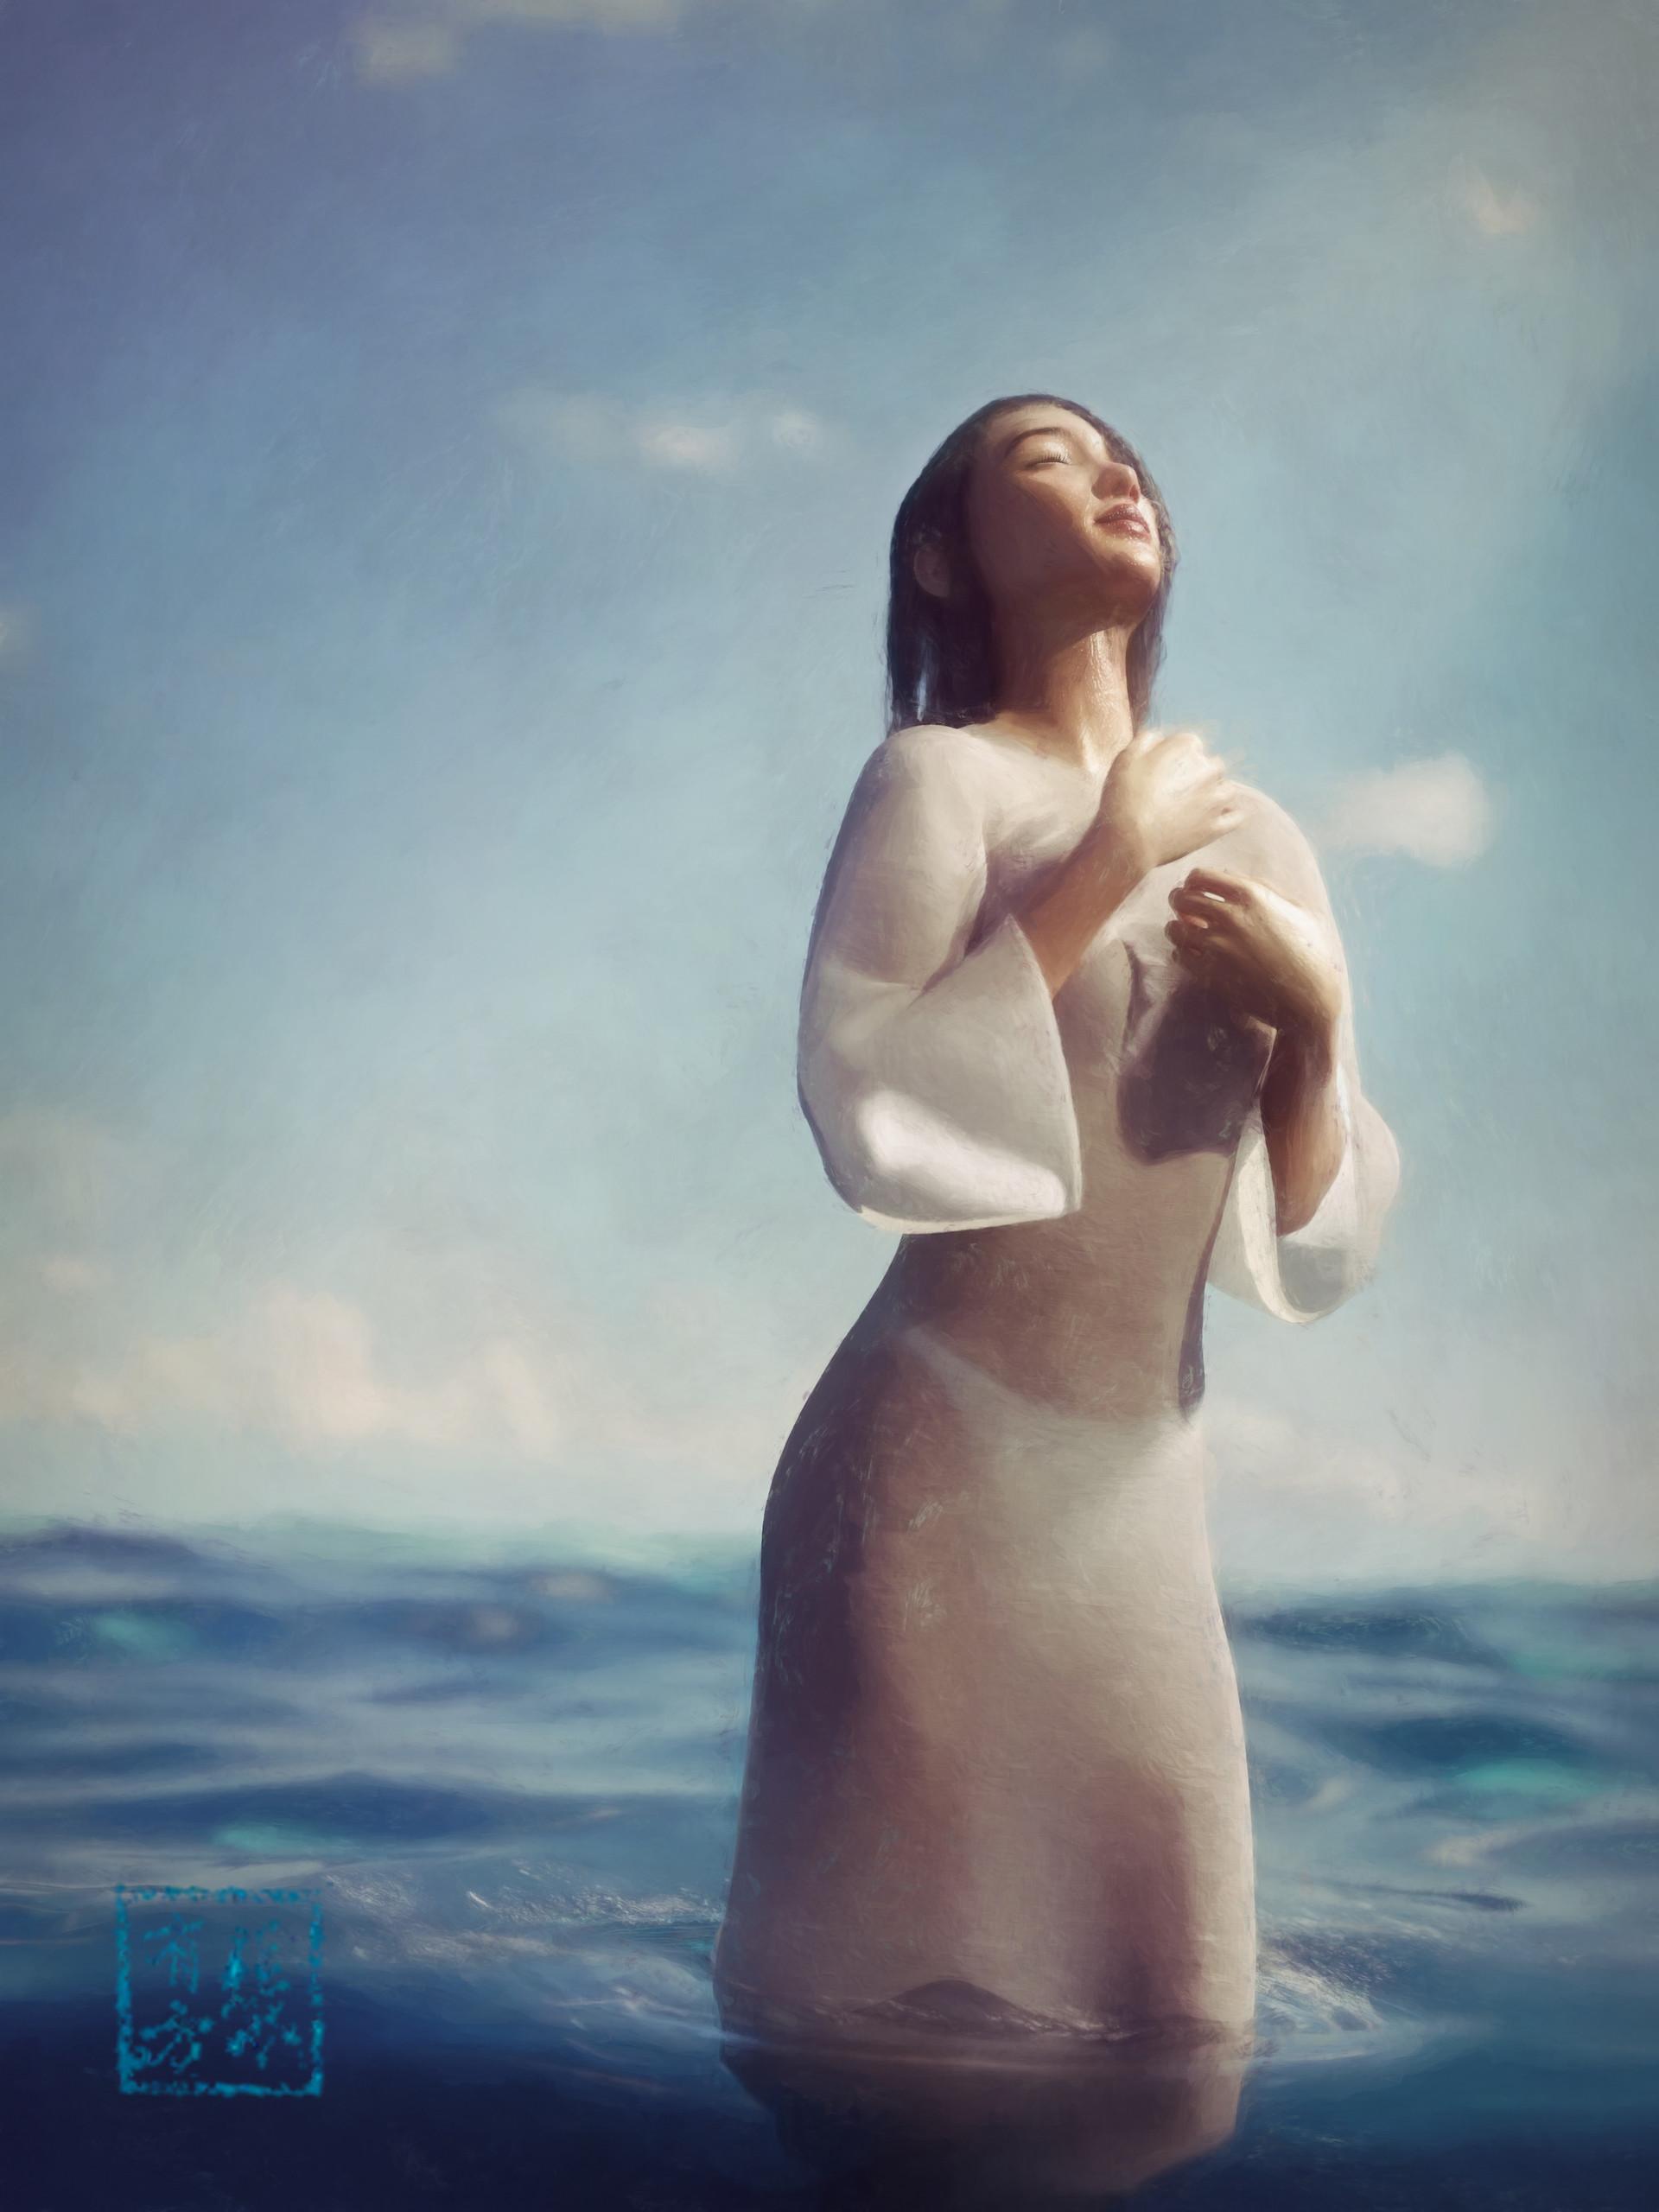 Benni a baptismal painted